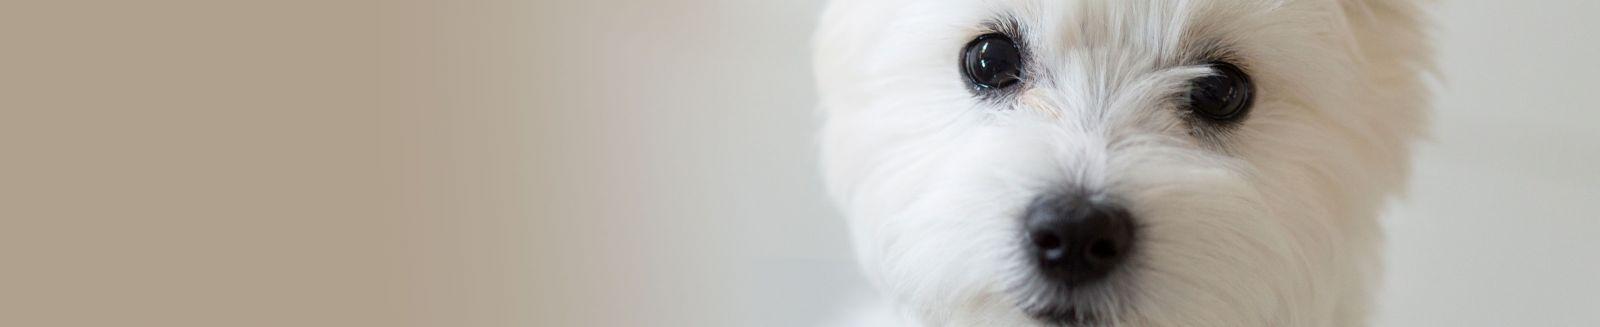 meibomian gland dog